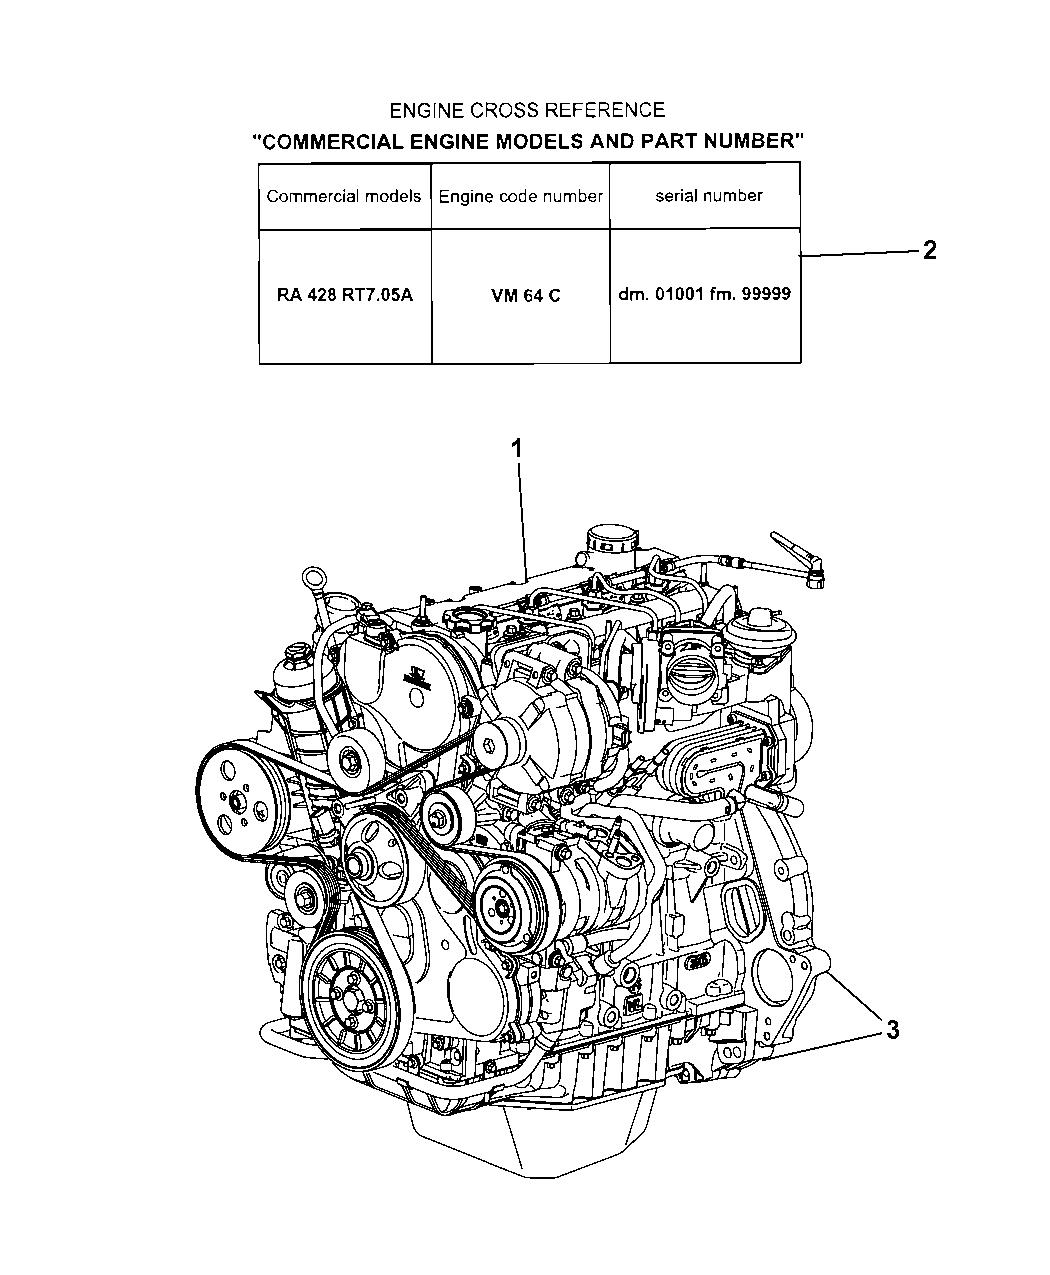 2012 Jeep Liberty Engine Assembly Service Mopar Parts Giant Diagram Thumbnail 2